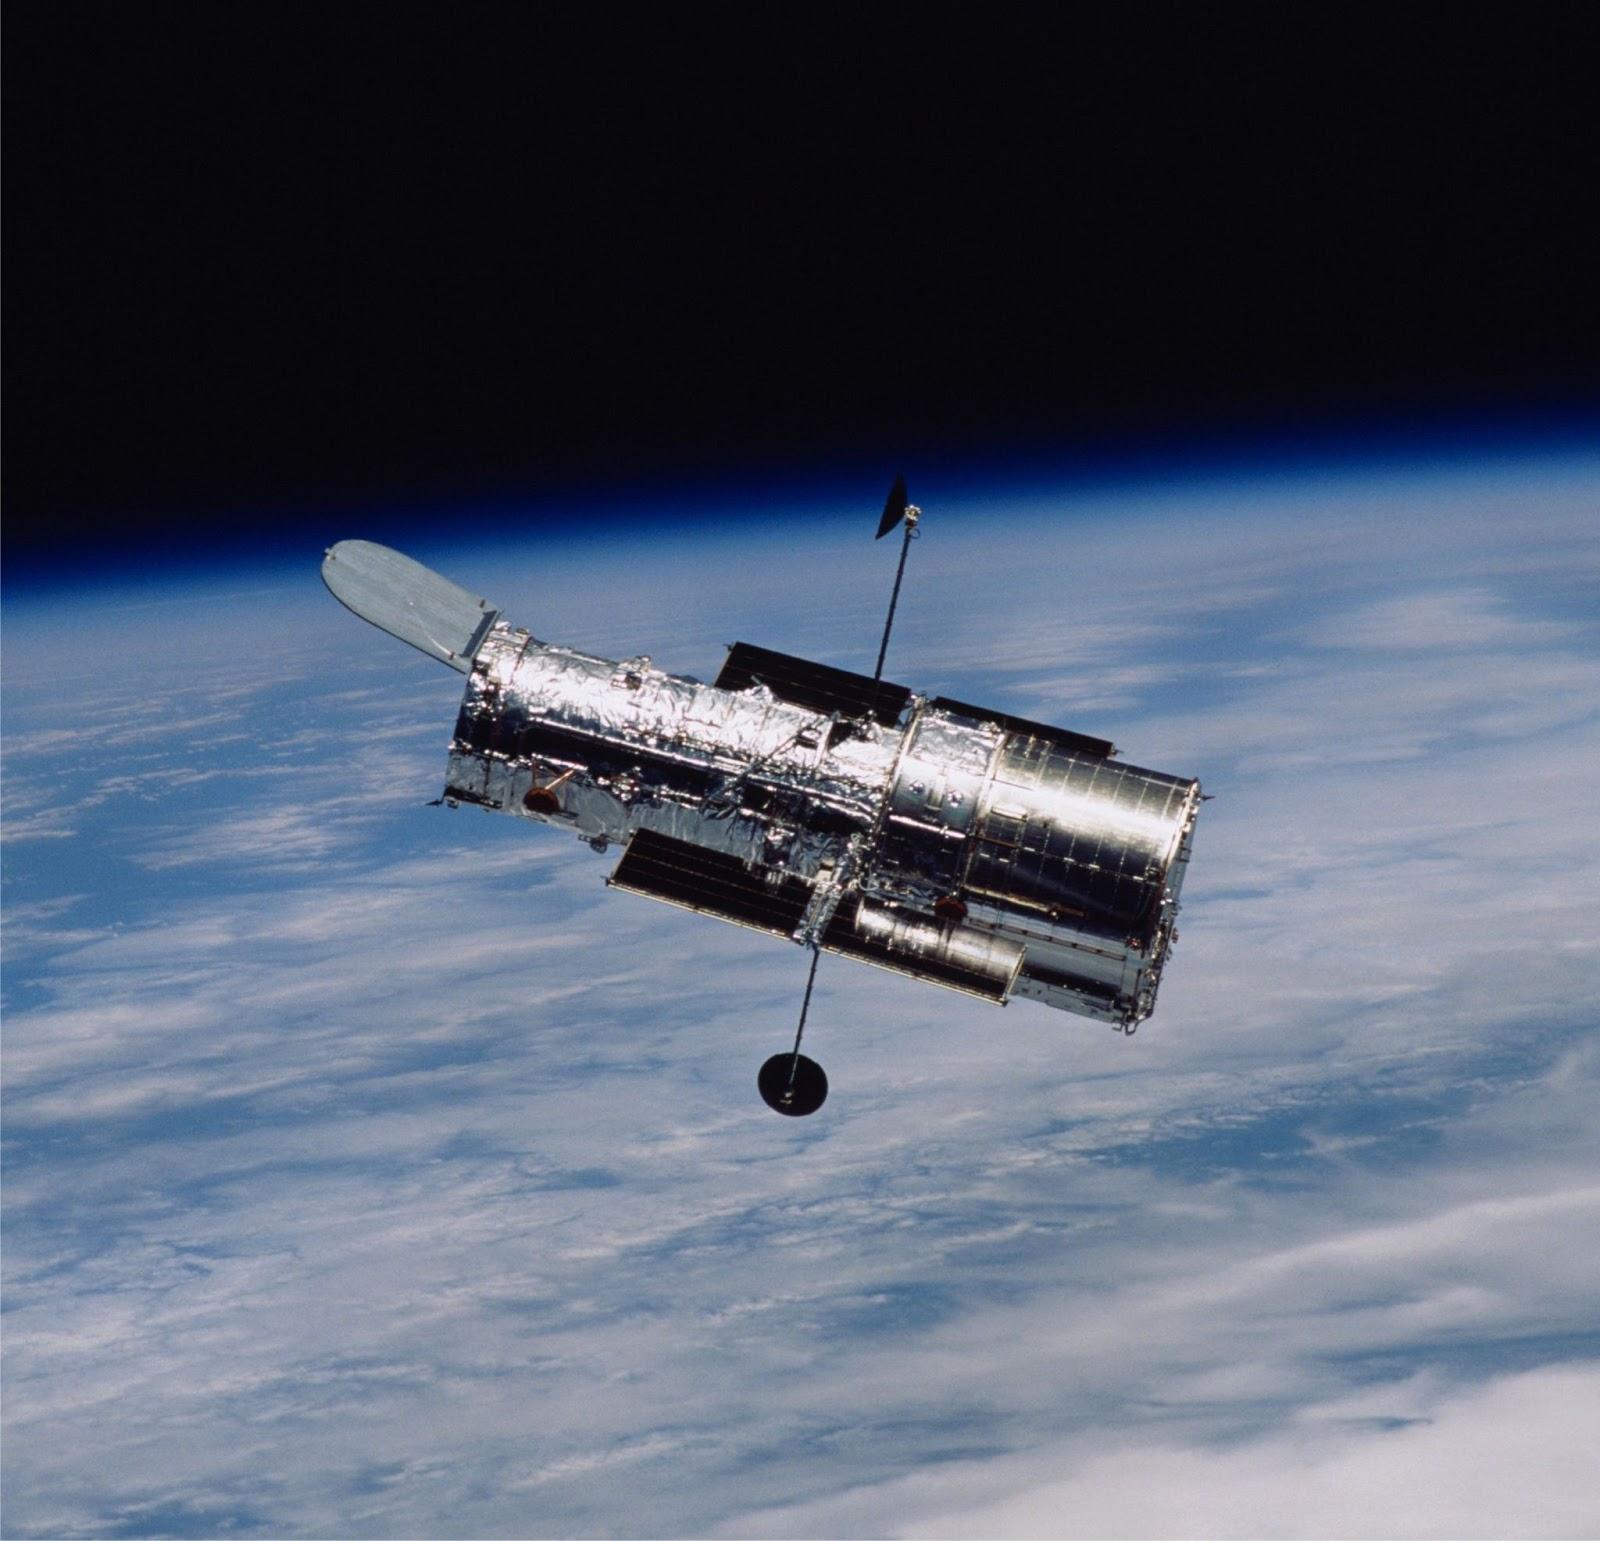 Телескоп «Хаббл». Источник: nasa.gov